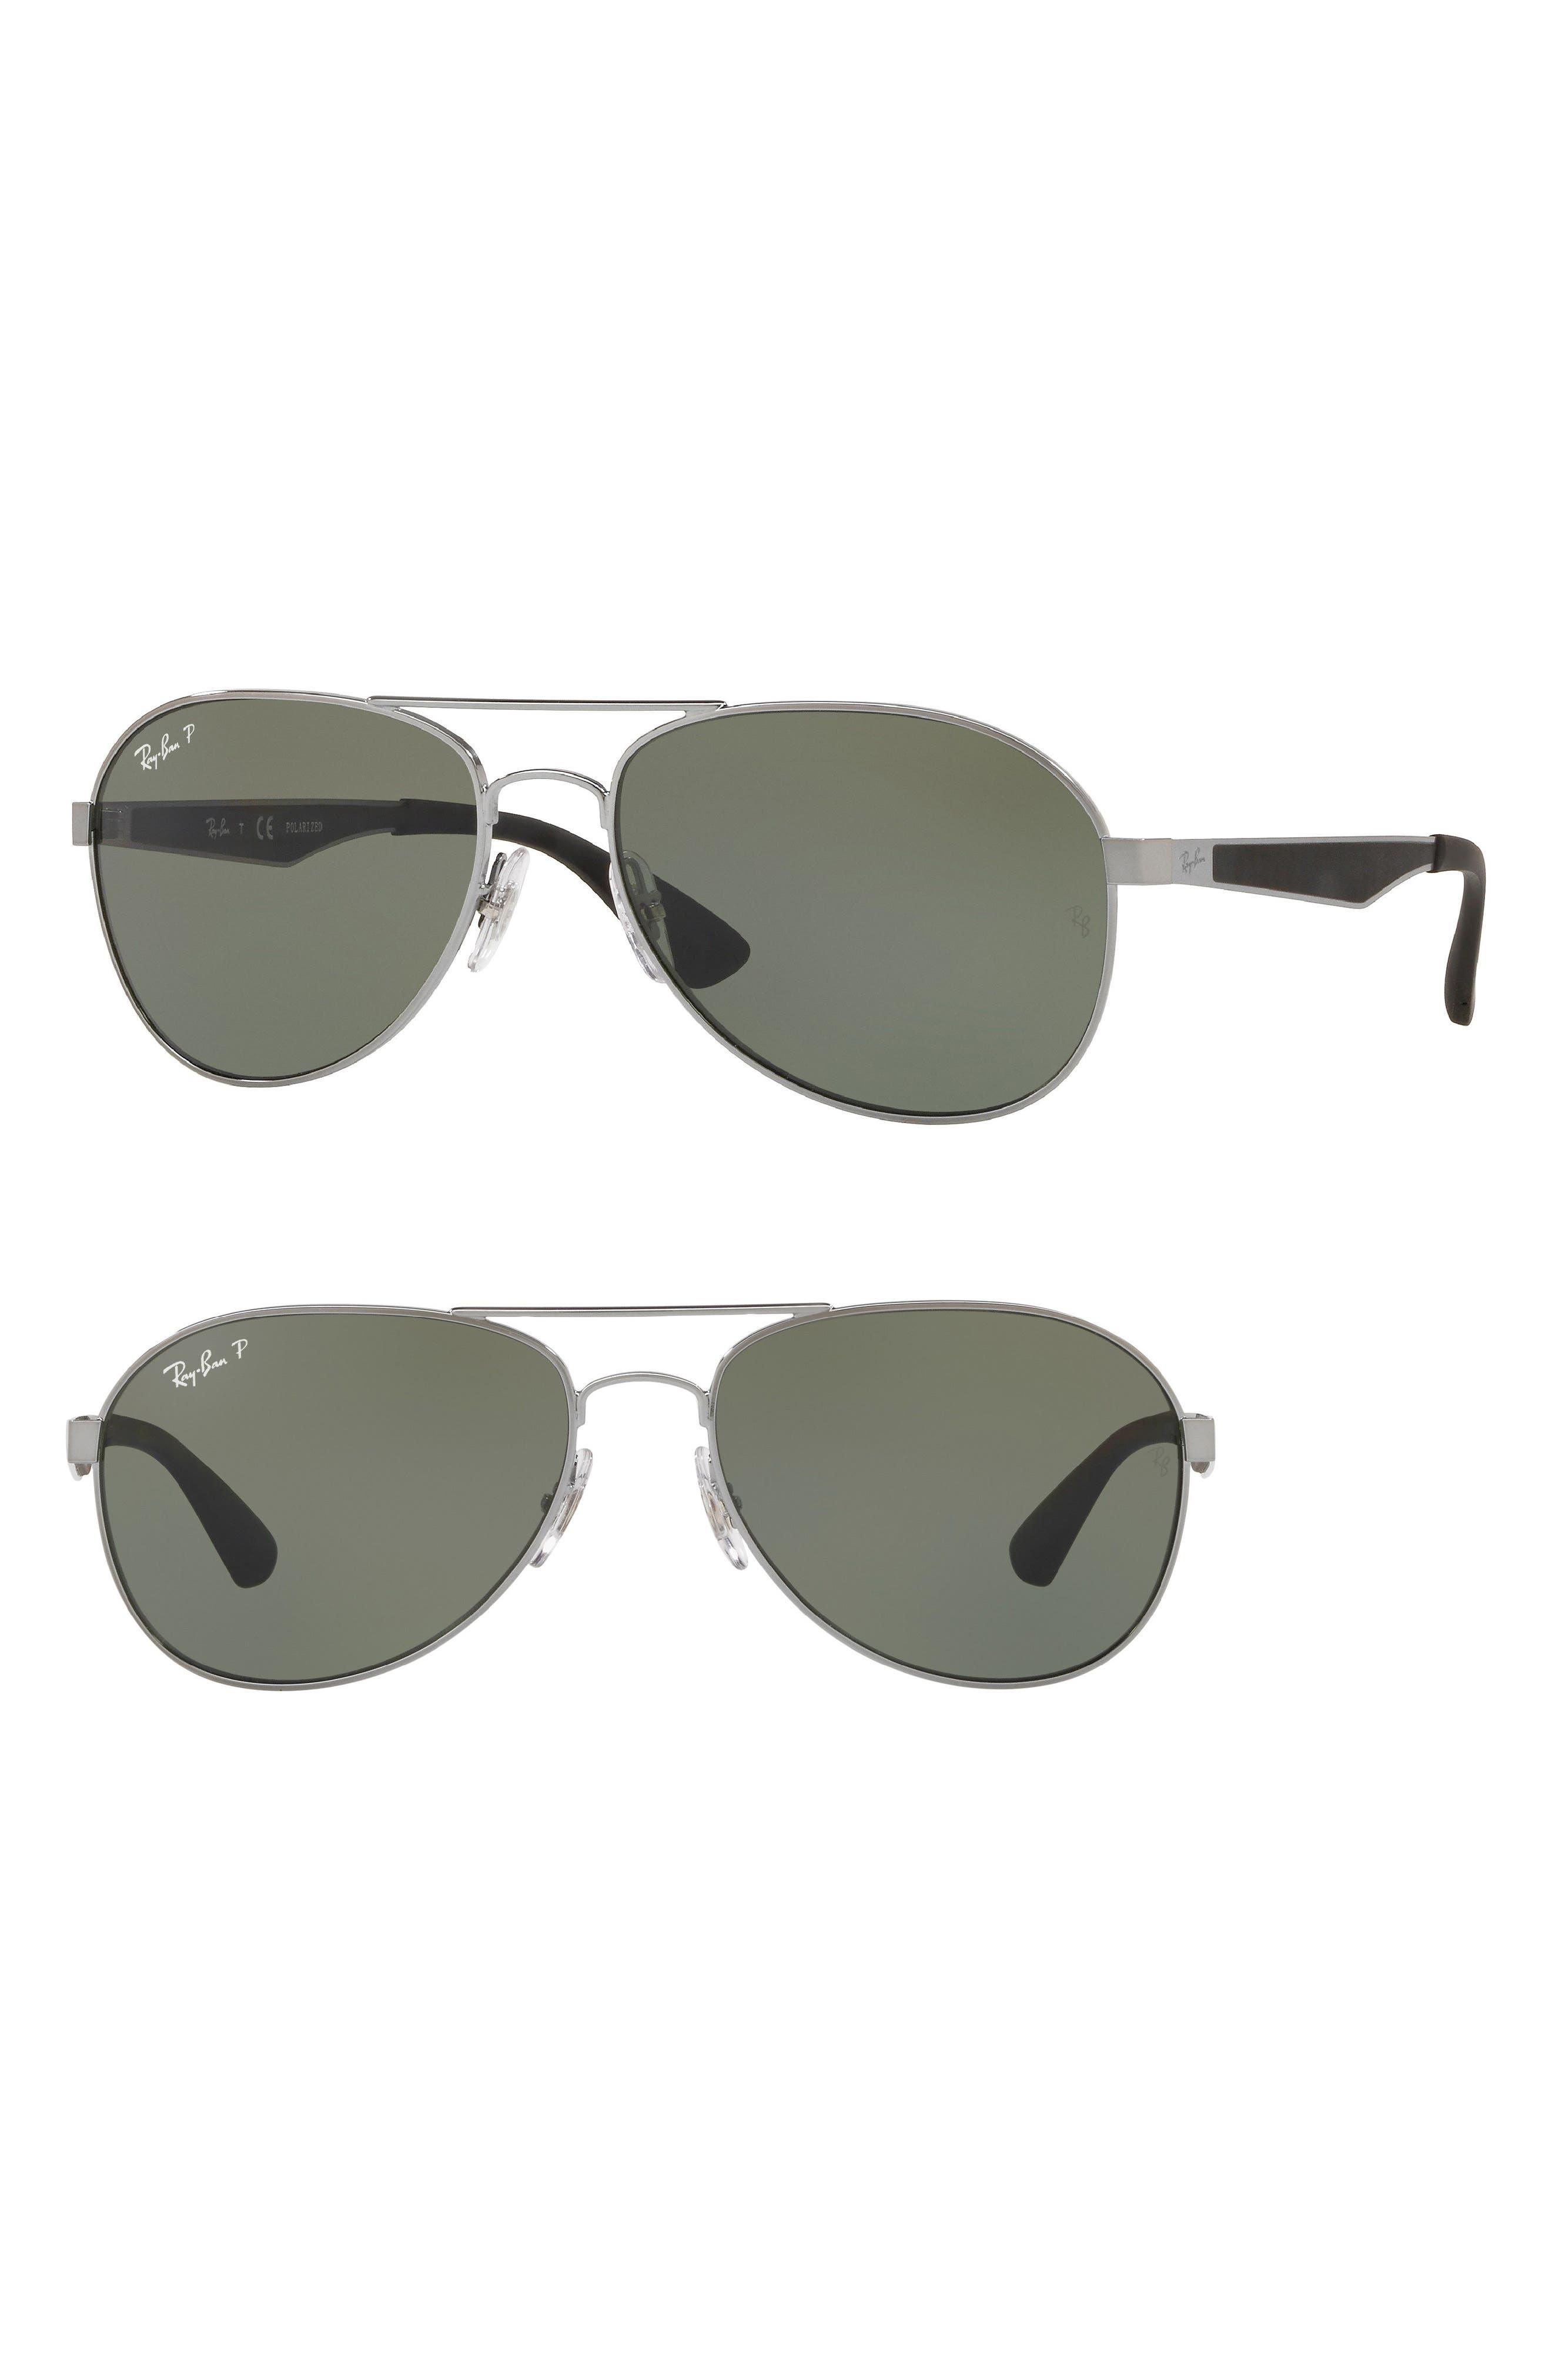 61mm Polarized Aviator Sunglasses,                             Main thumbnail 1, color,                             Gunmetal